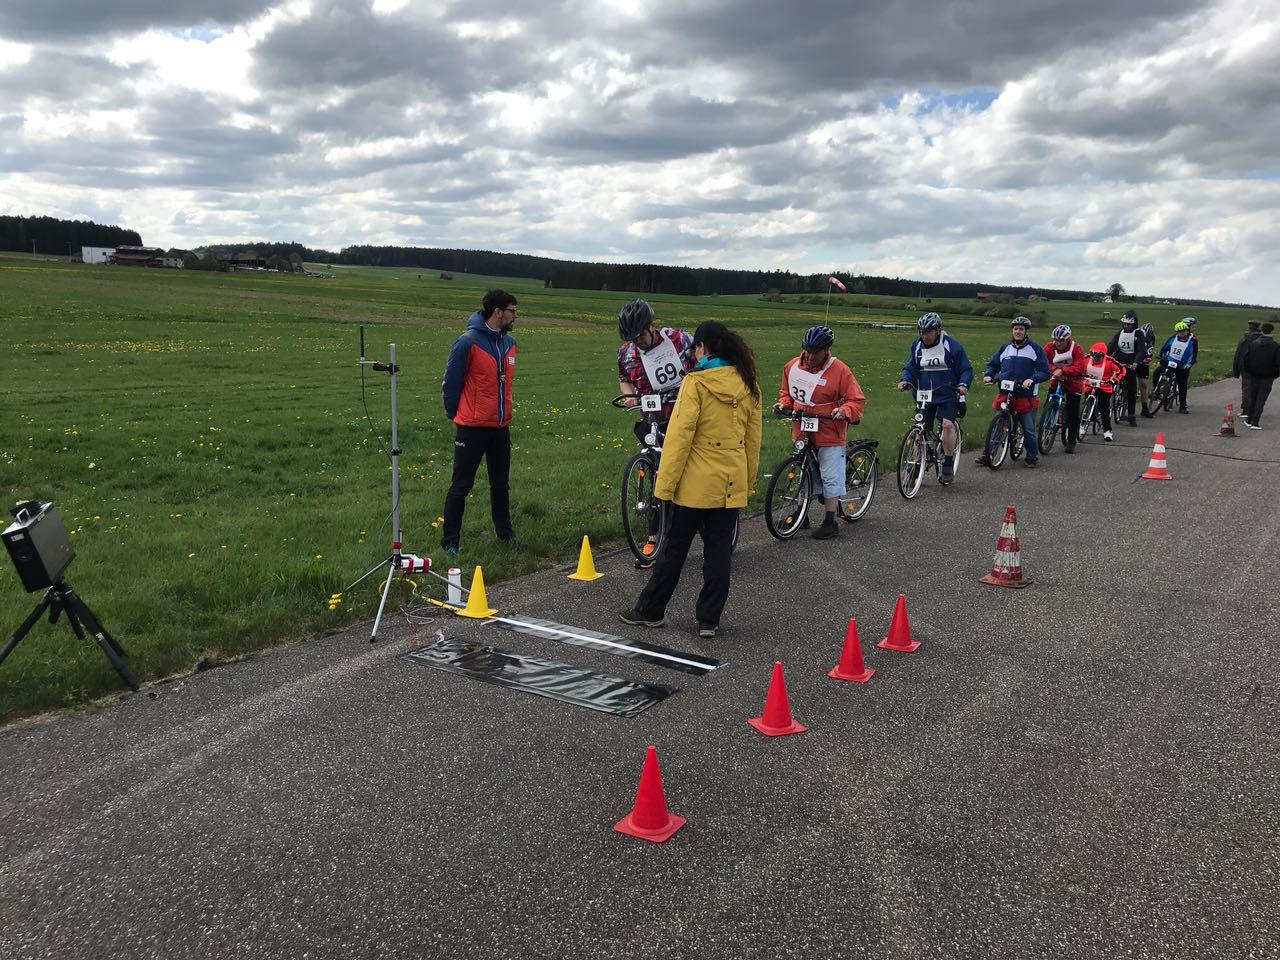 Radsporttag der BruderhausDiakonie - Special Olympics Baden-Württemberg 2018_4_Lars WIllems